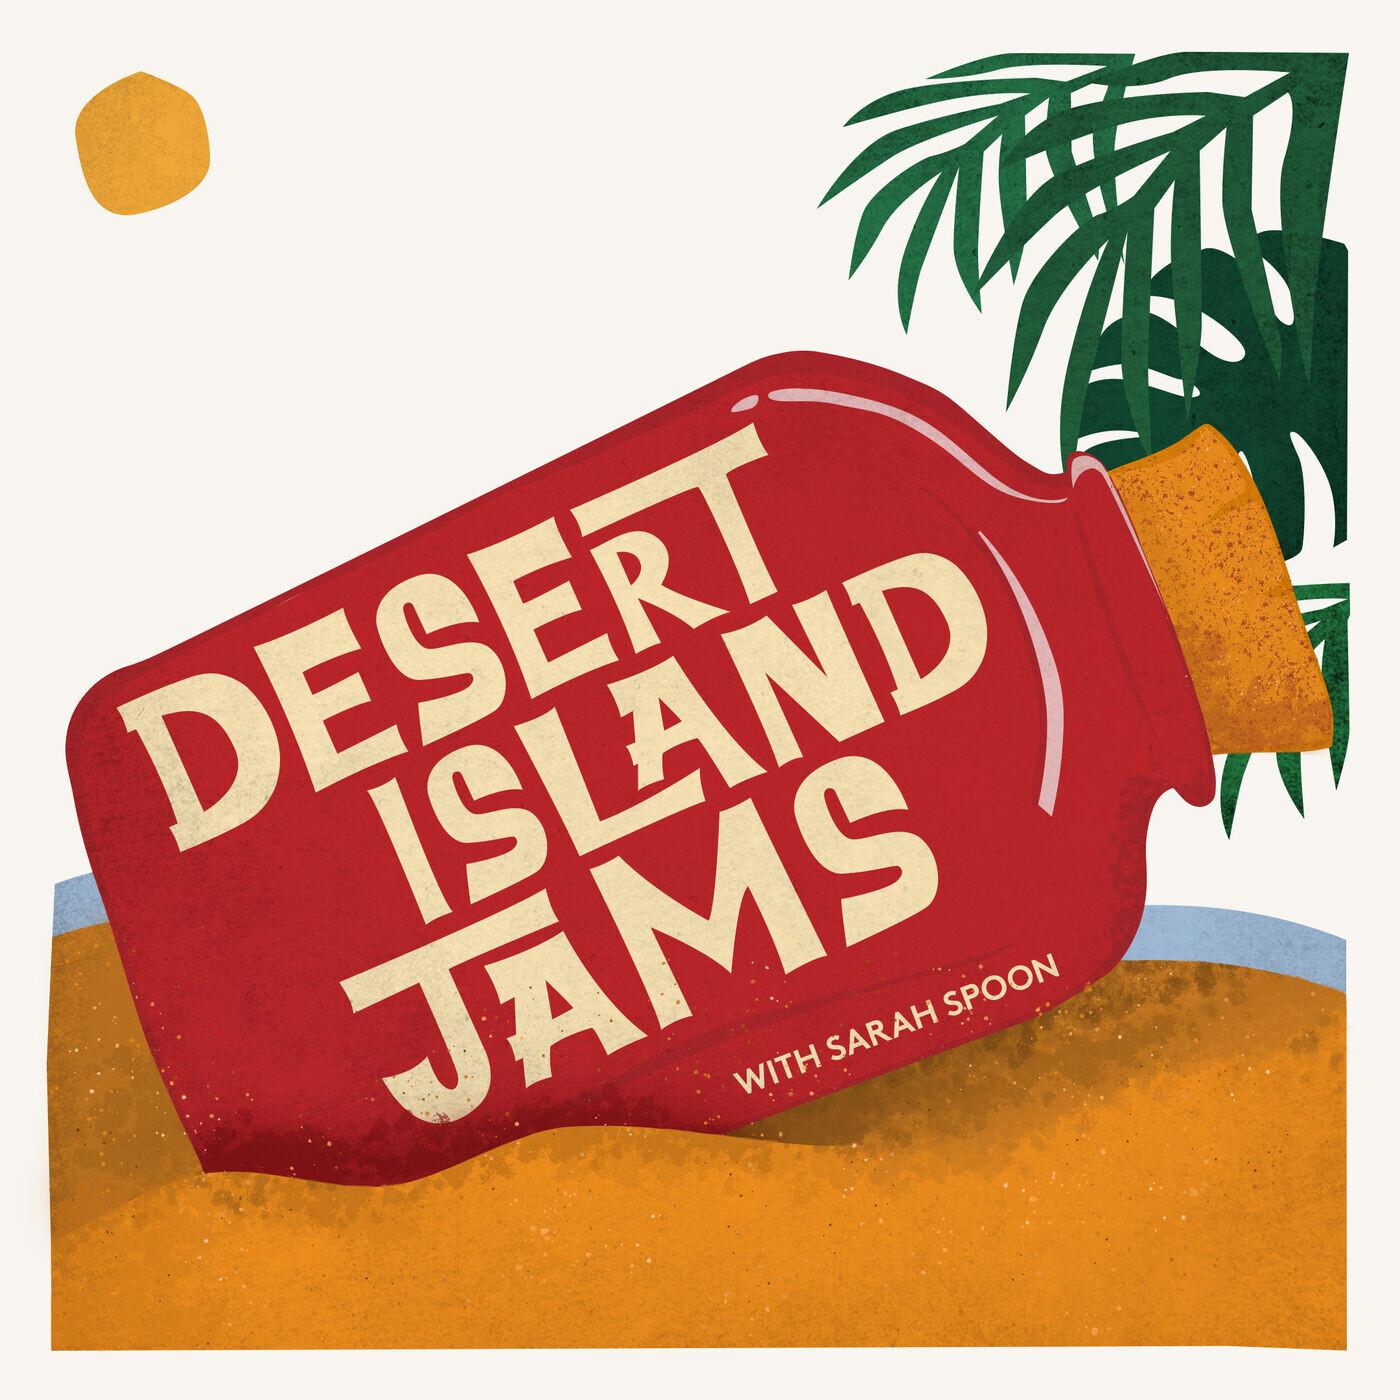 Desert Island Jams #5 - Albert Alva